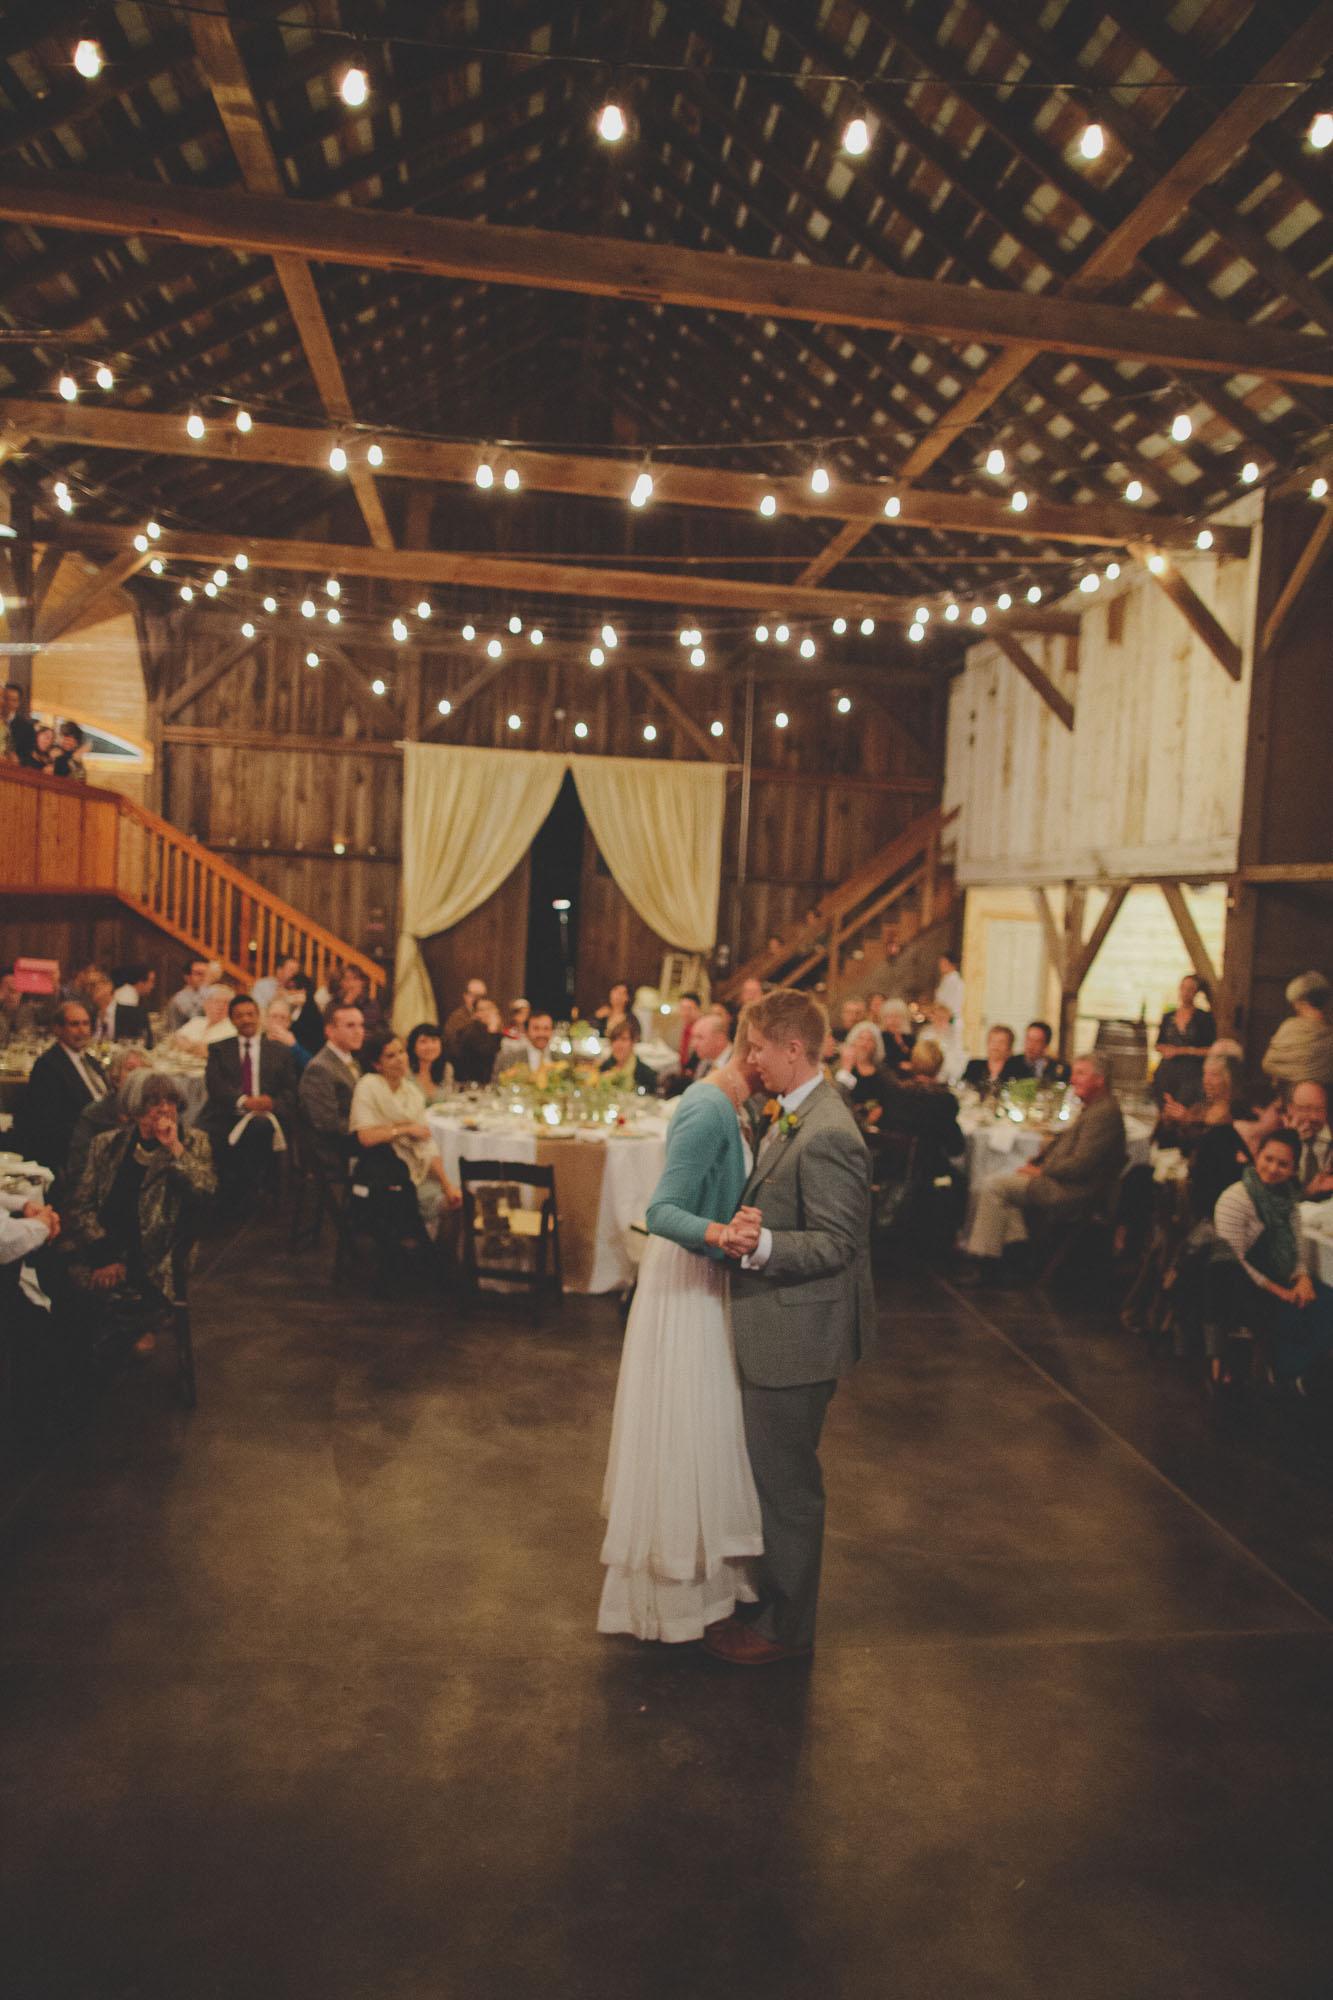 Gretchen_Gause_Petaluma_Olympias_Valley_Wedding_Photo-333.jpg